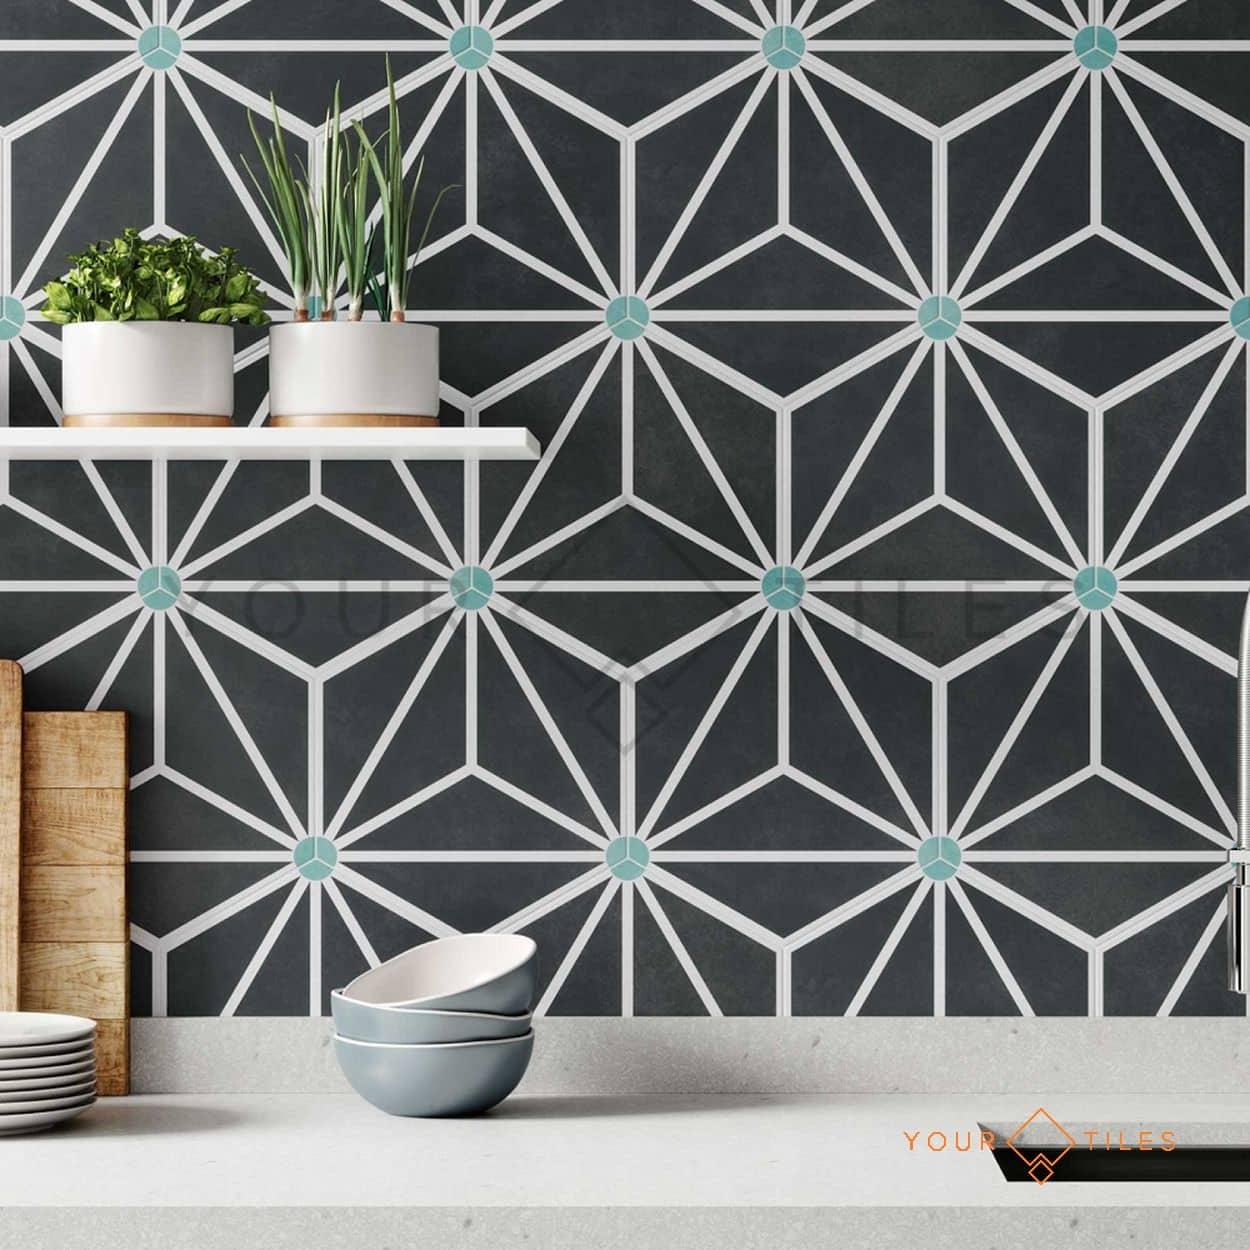 Jasmine Hexagon Collection